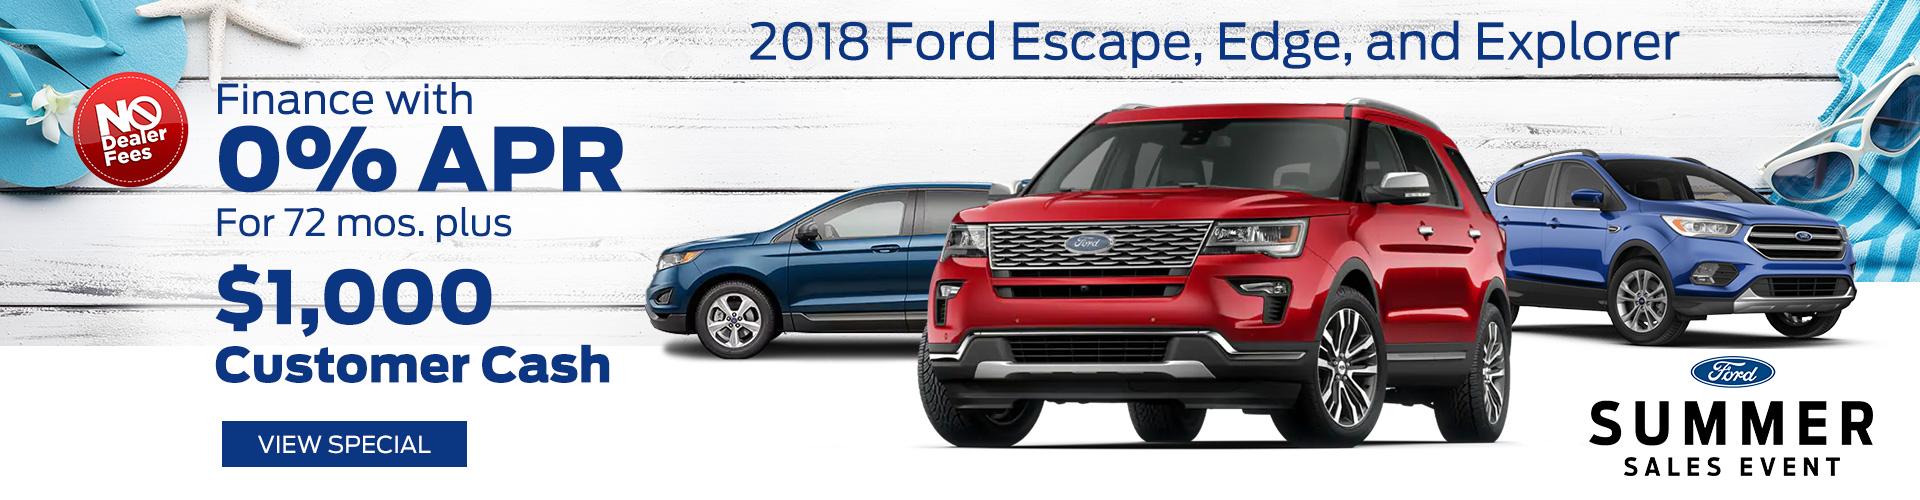 July 2018 Ford Escape, Edge, & Explorer Special